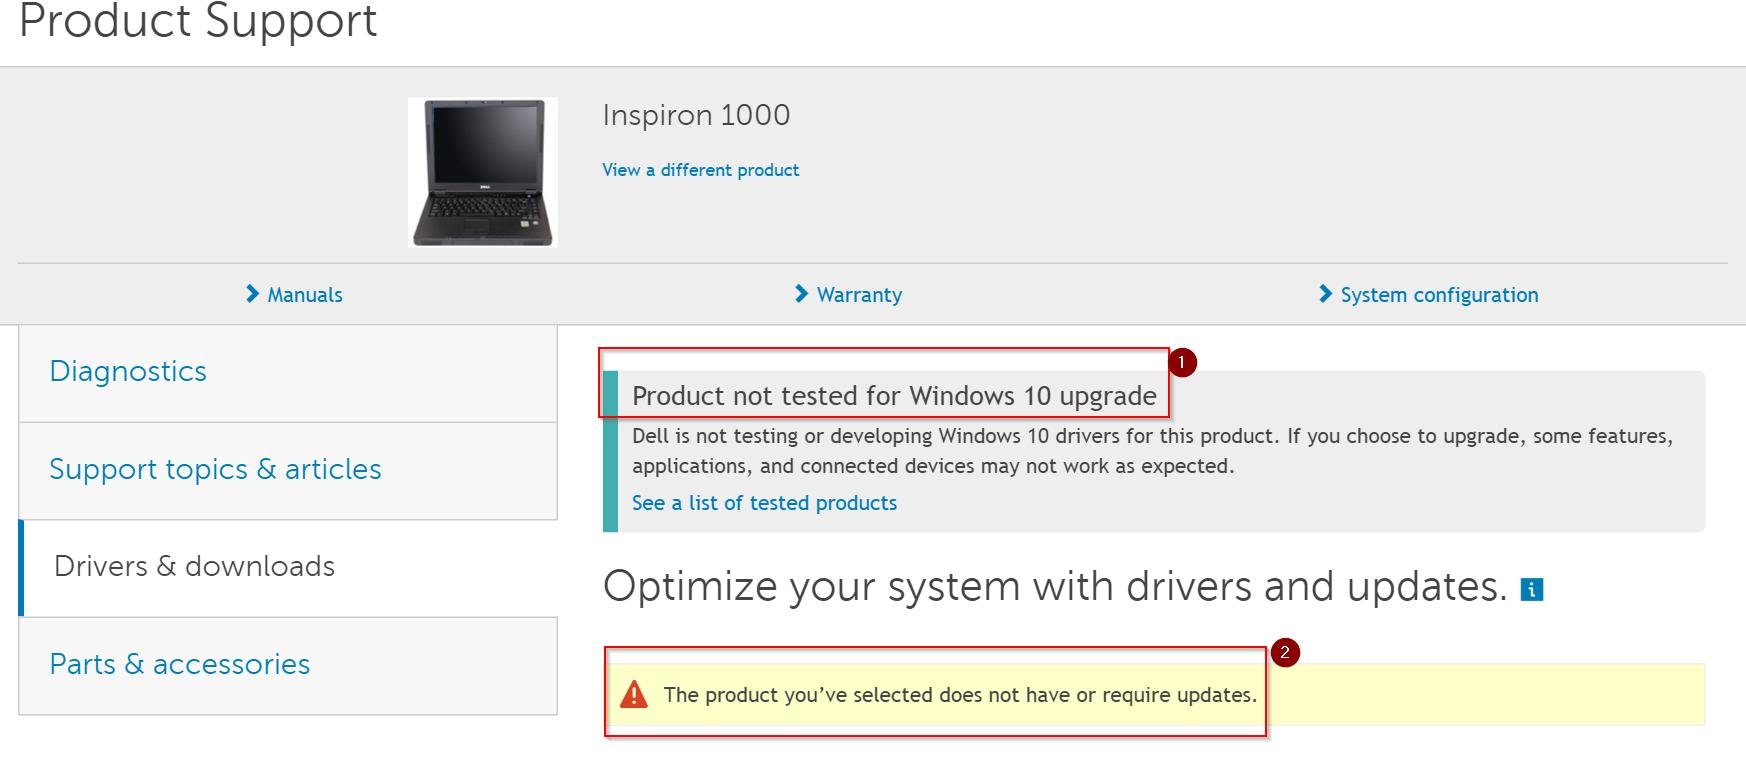 hdmi driver for windows 8.1 64 bit free download